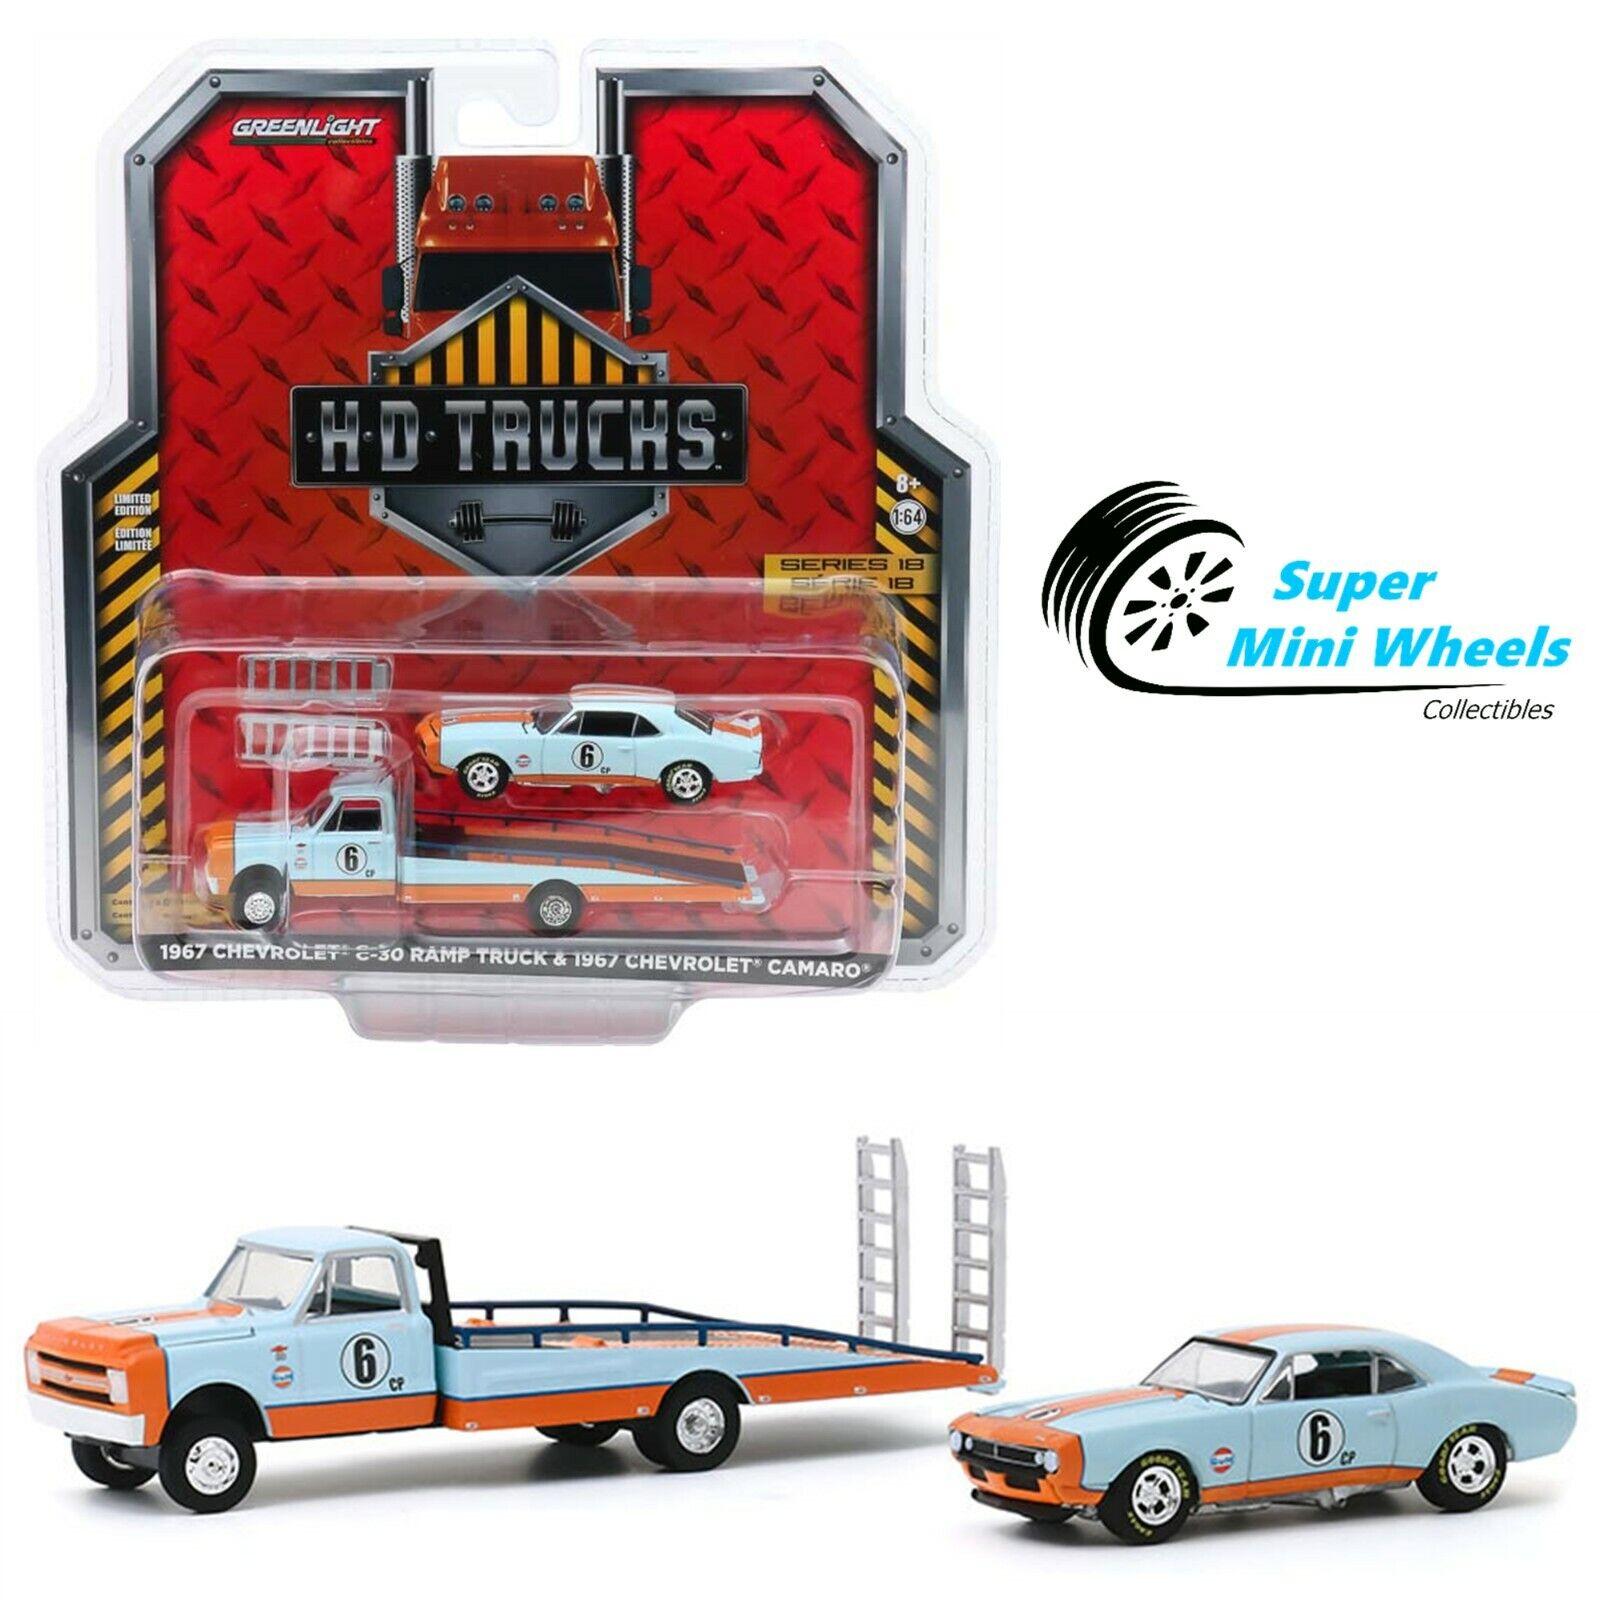 Greenlight 1:64 1967 Chevrolet C-30 Ramp Truck Gulf & 1967 C